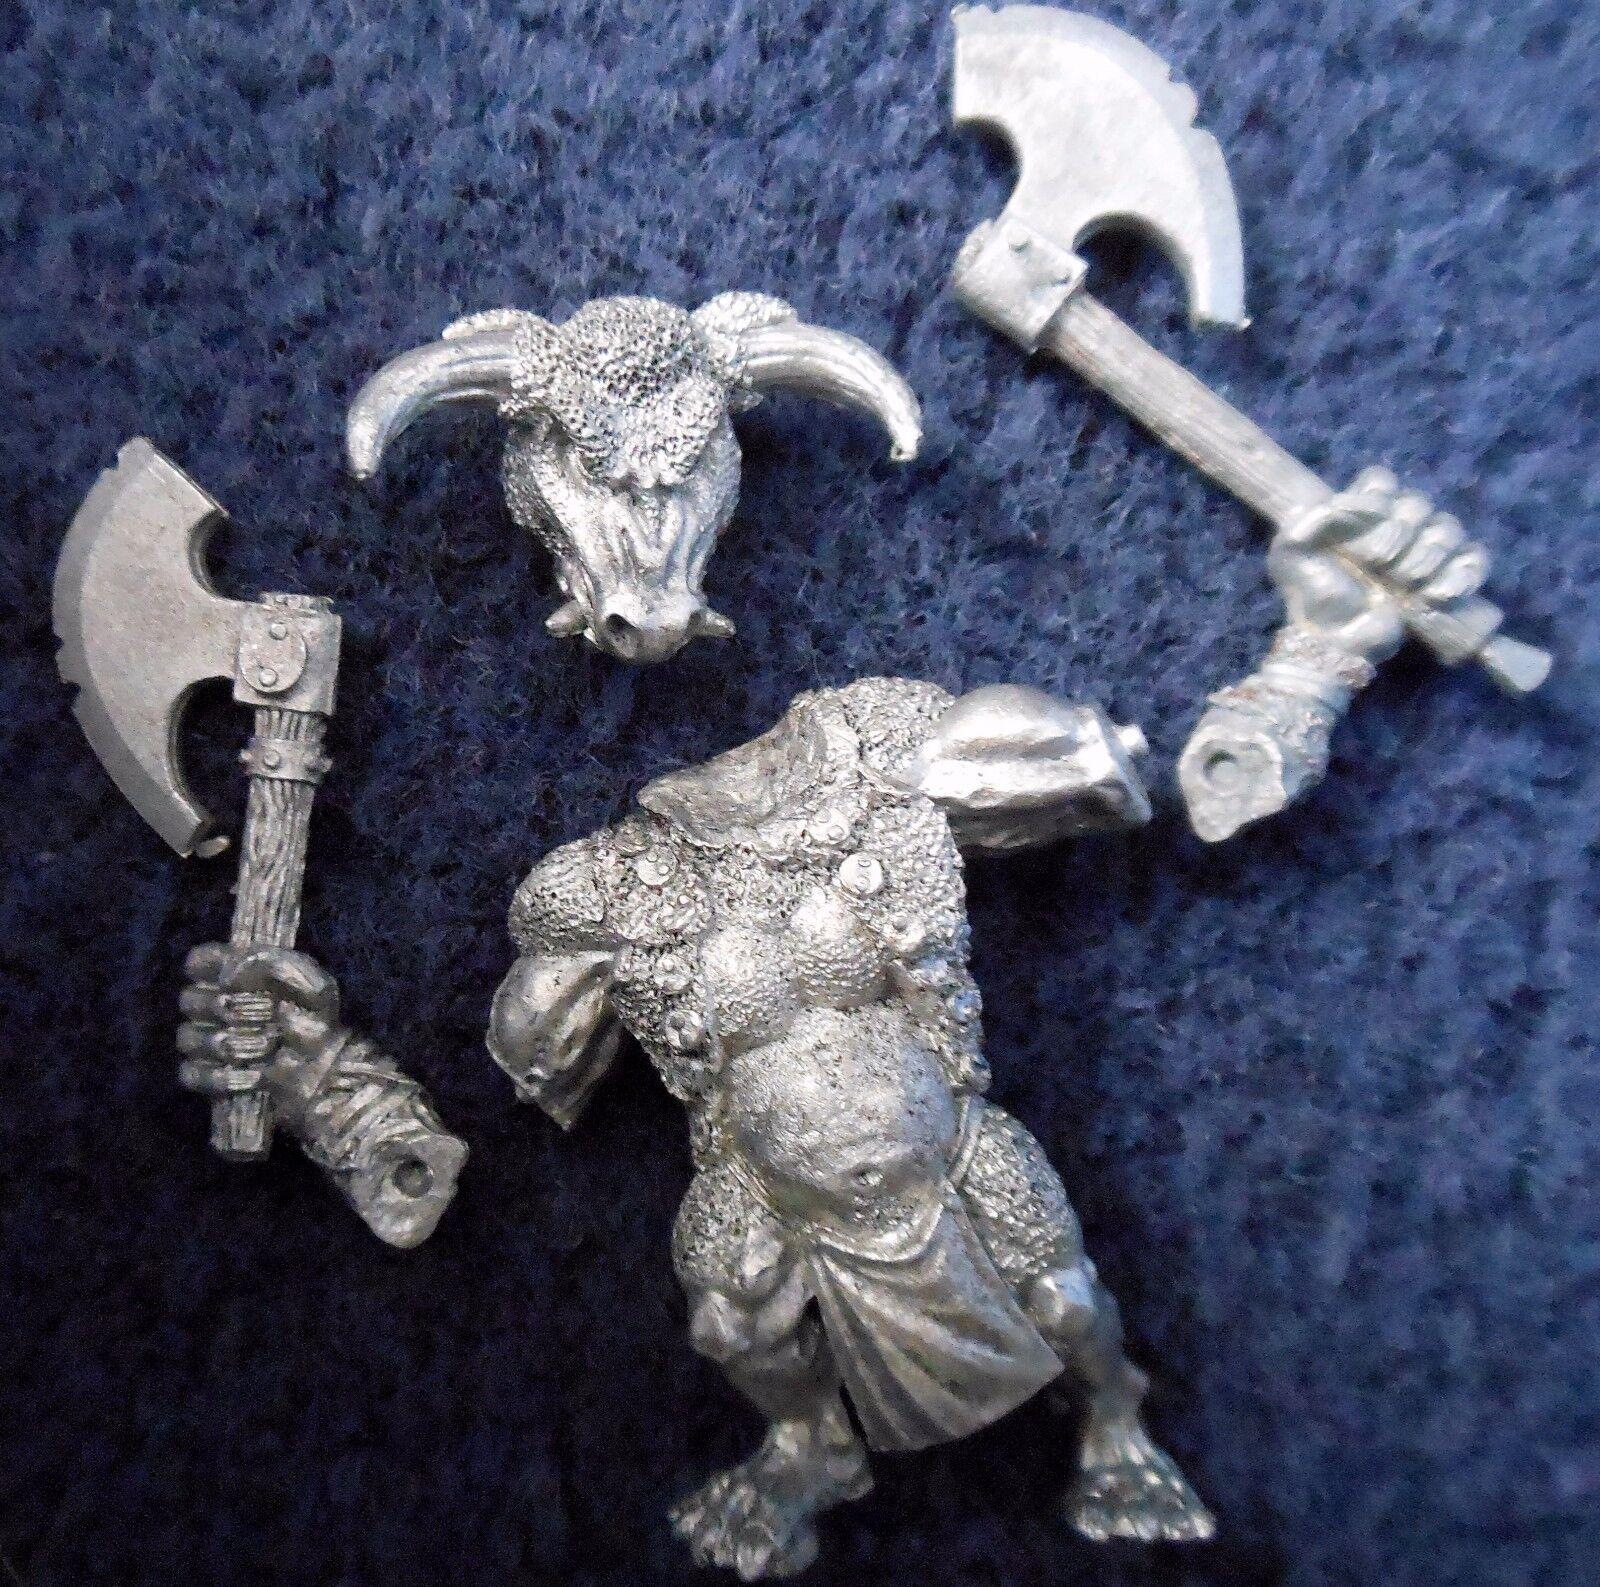 1998 Chaos Beastman Minotaur with Additional Hand Weapon 3 Citadel Beastmen Army